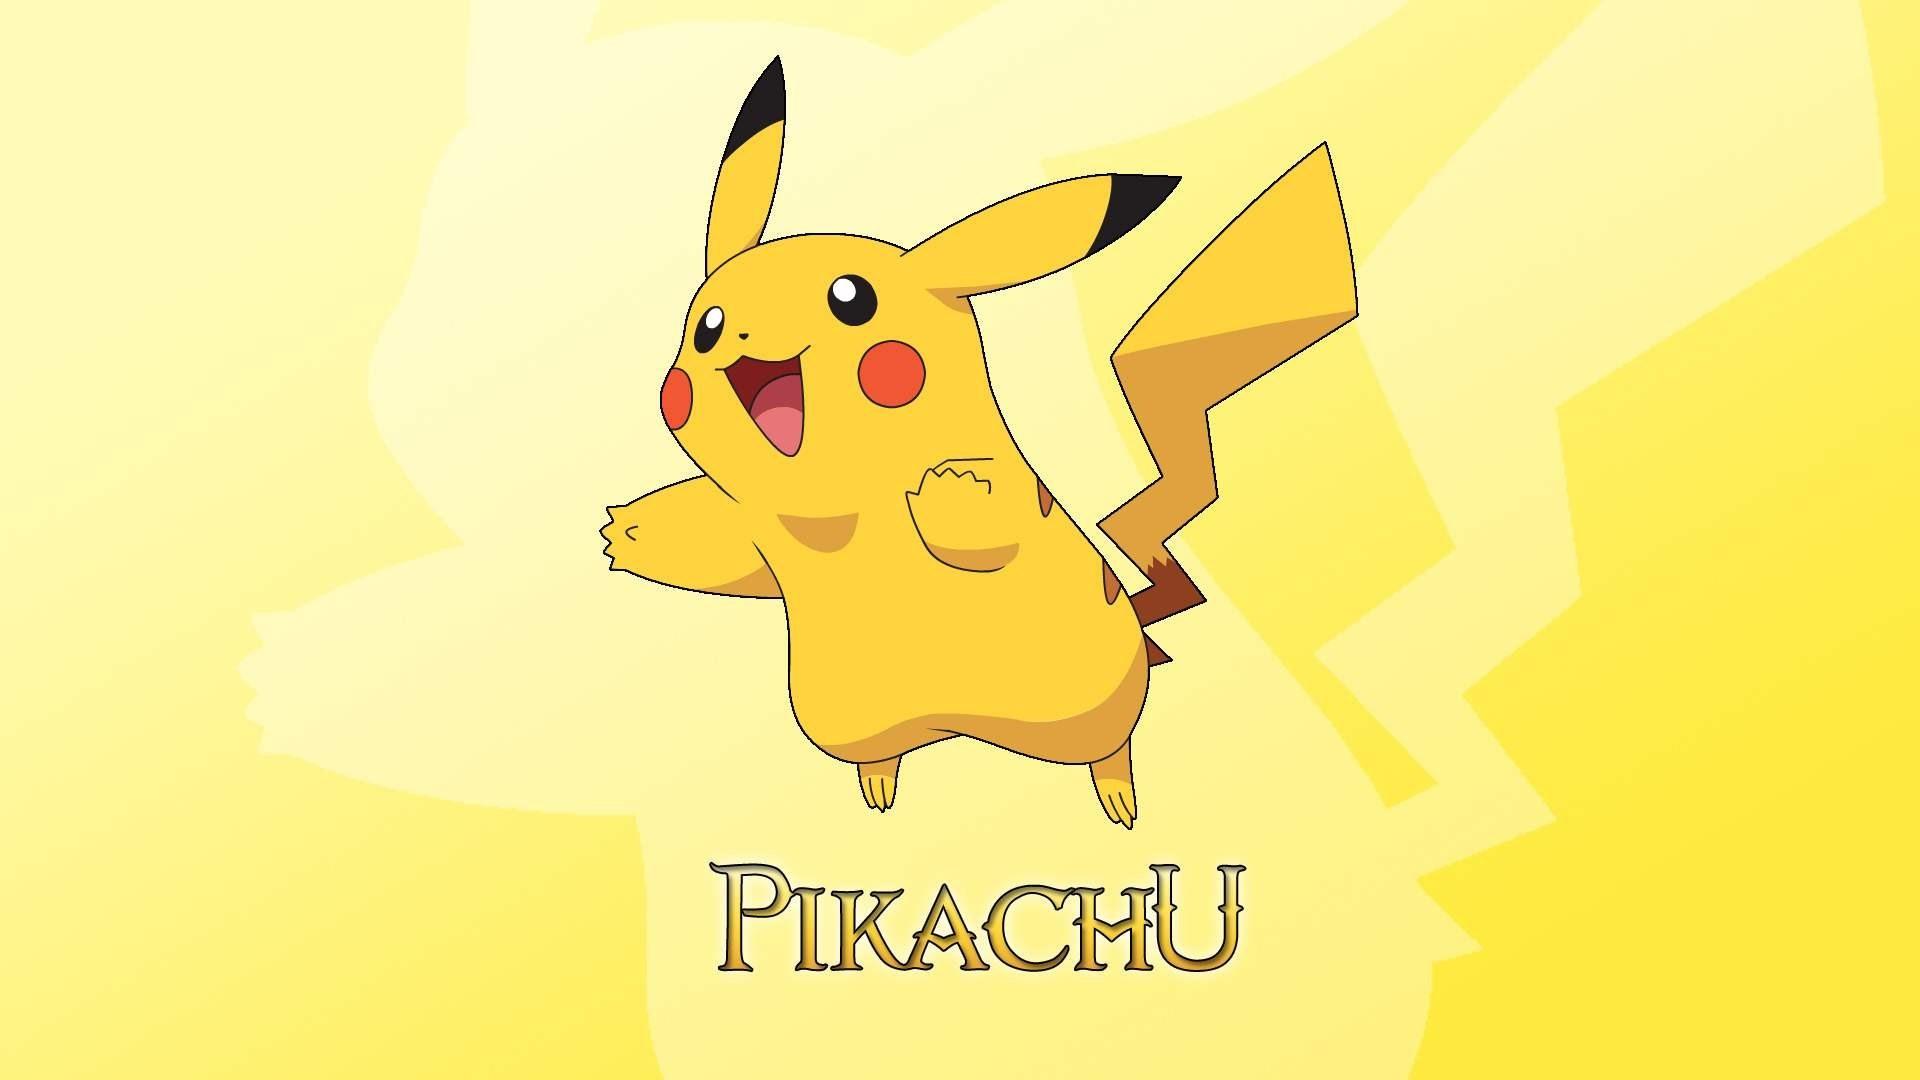 pikachu hd wallpapers